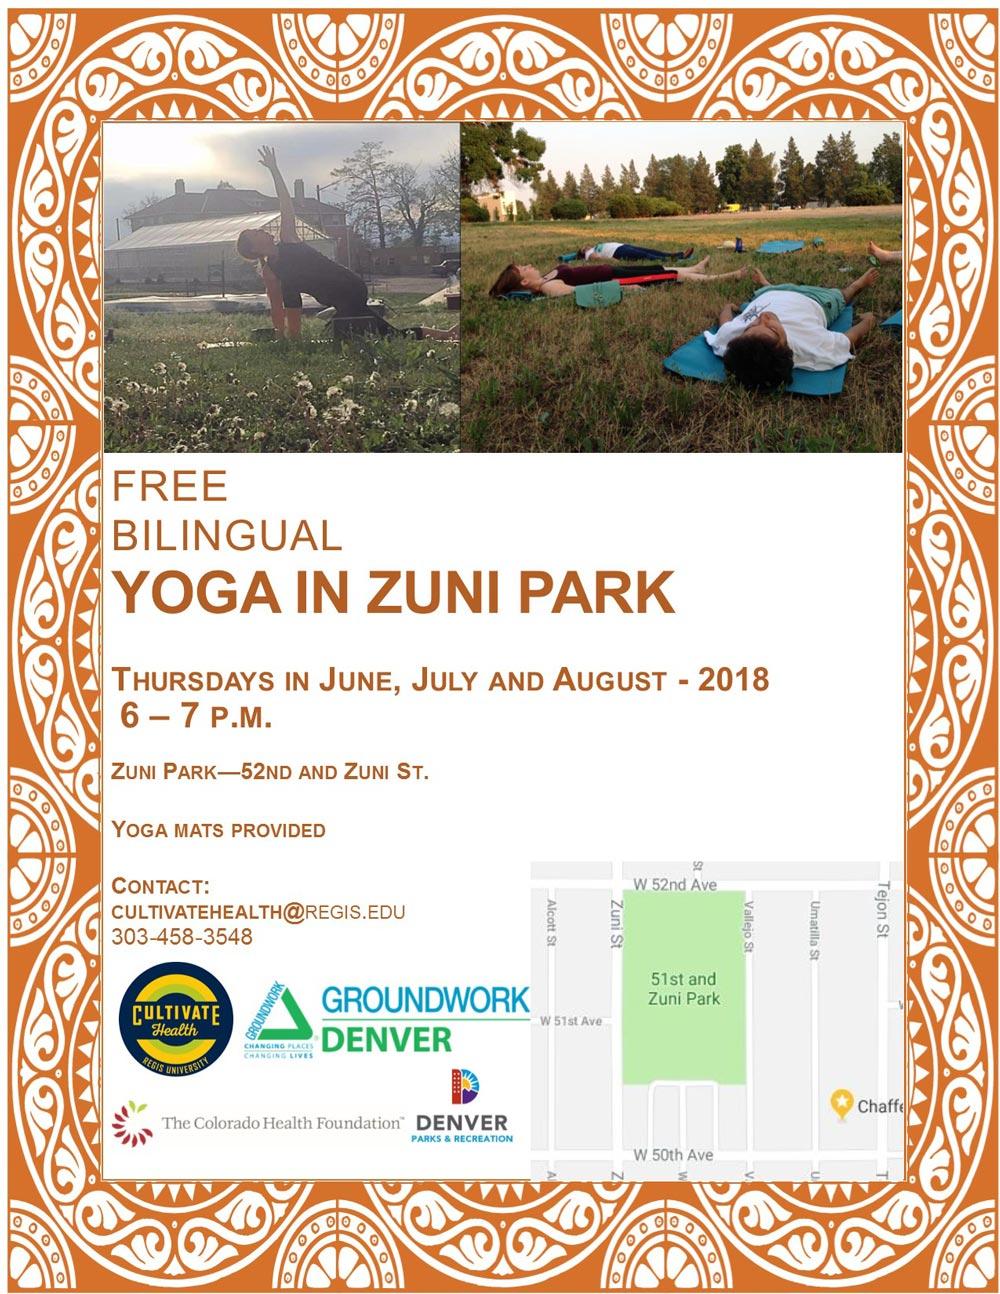 #2.-Event---Yoga-in-Zuni-Park-2018-flyer-ENGLISH.jpg